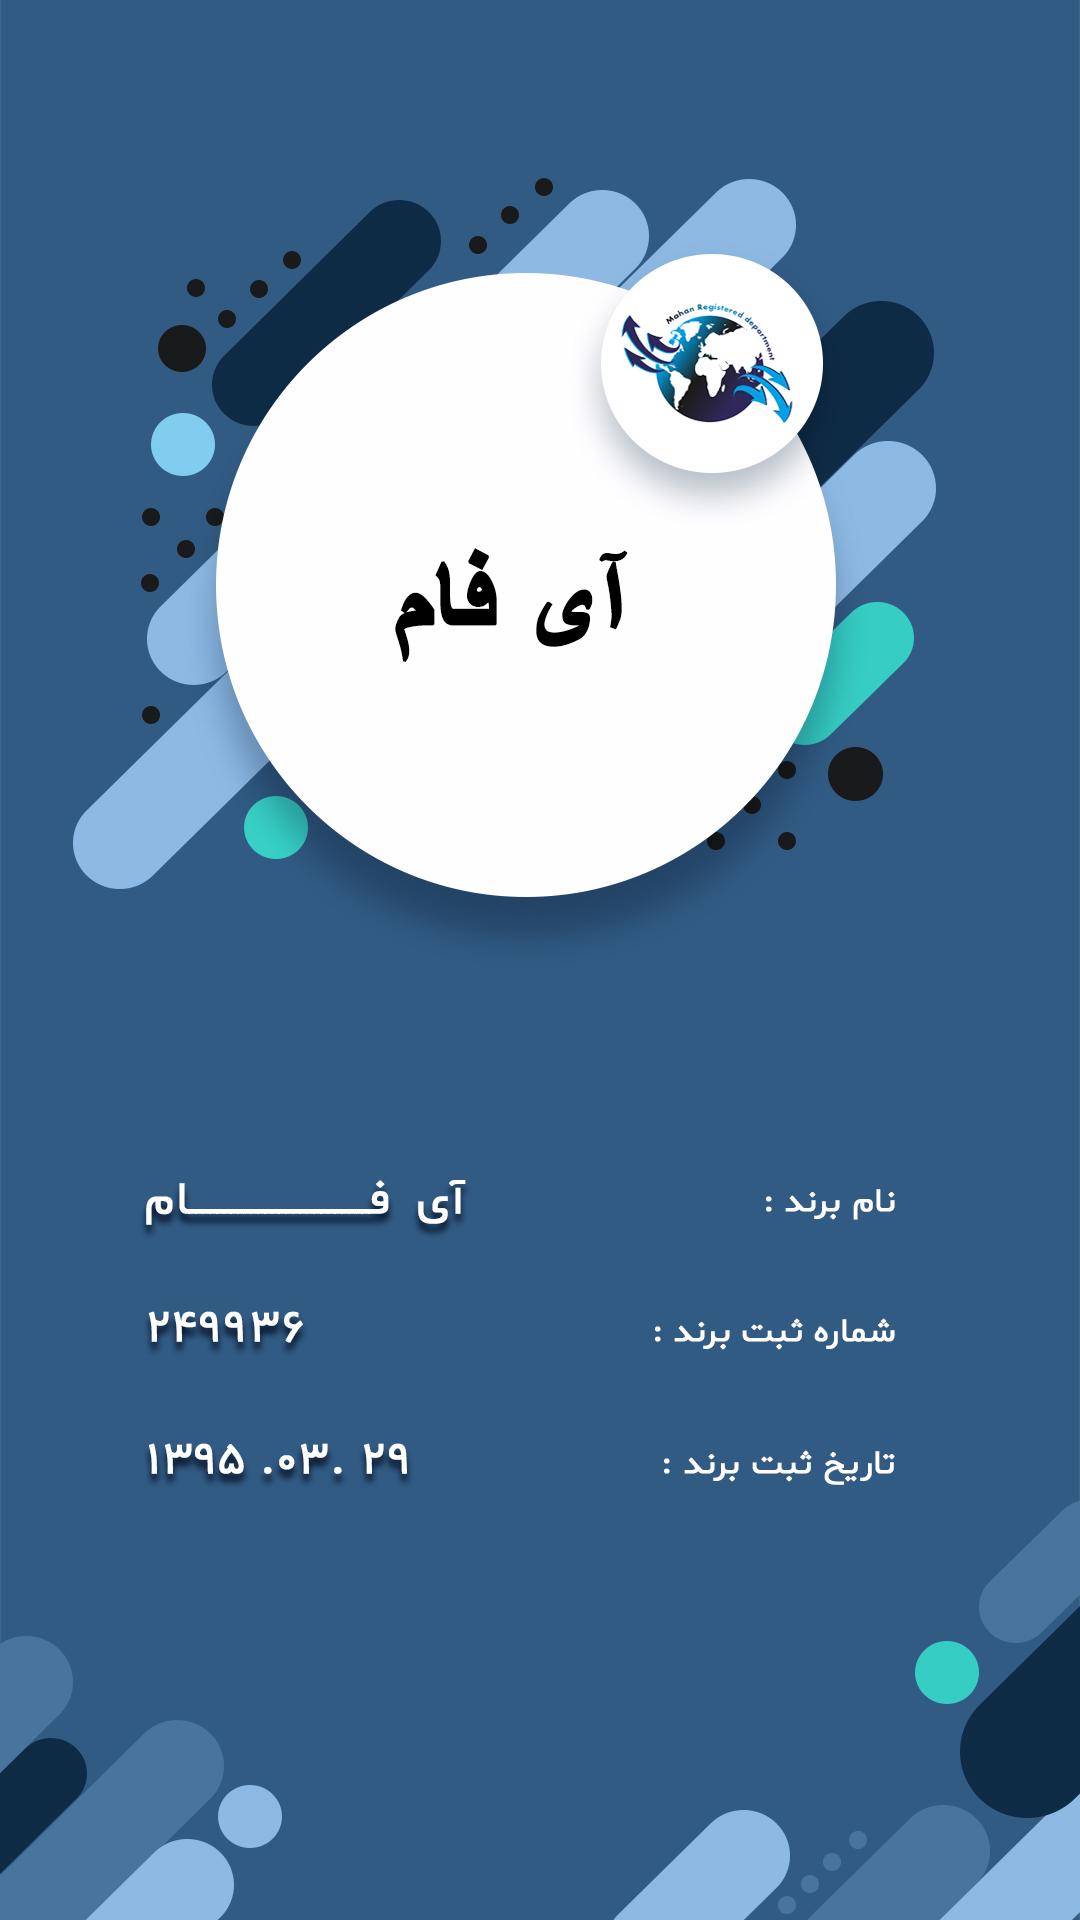 Mahan-Story-br-21-24899